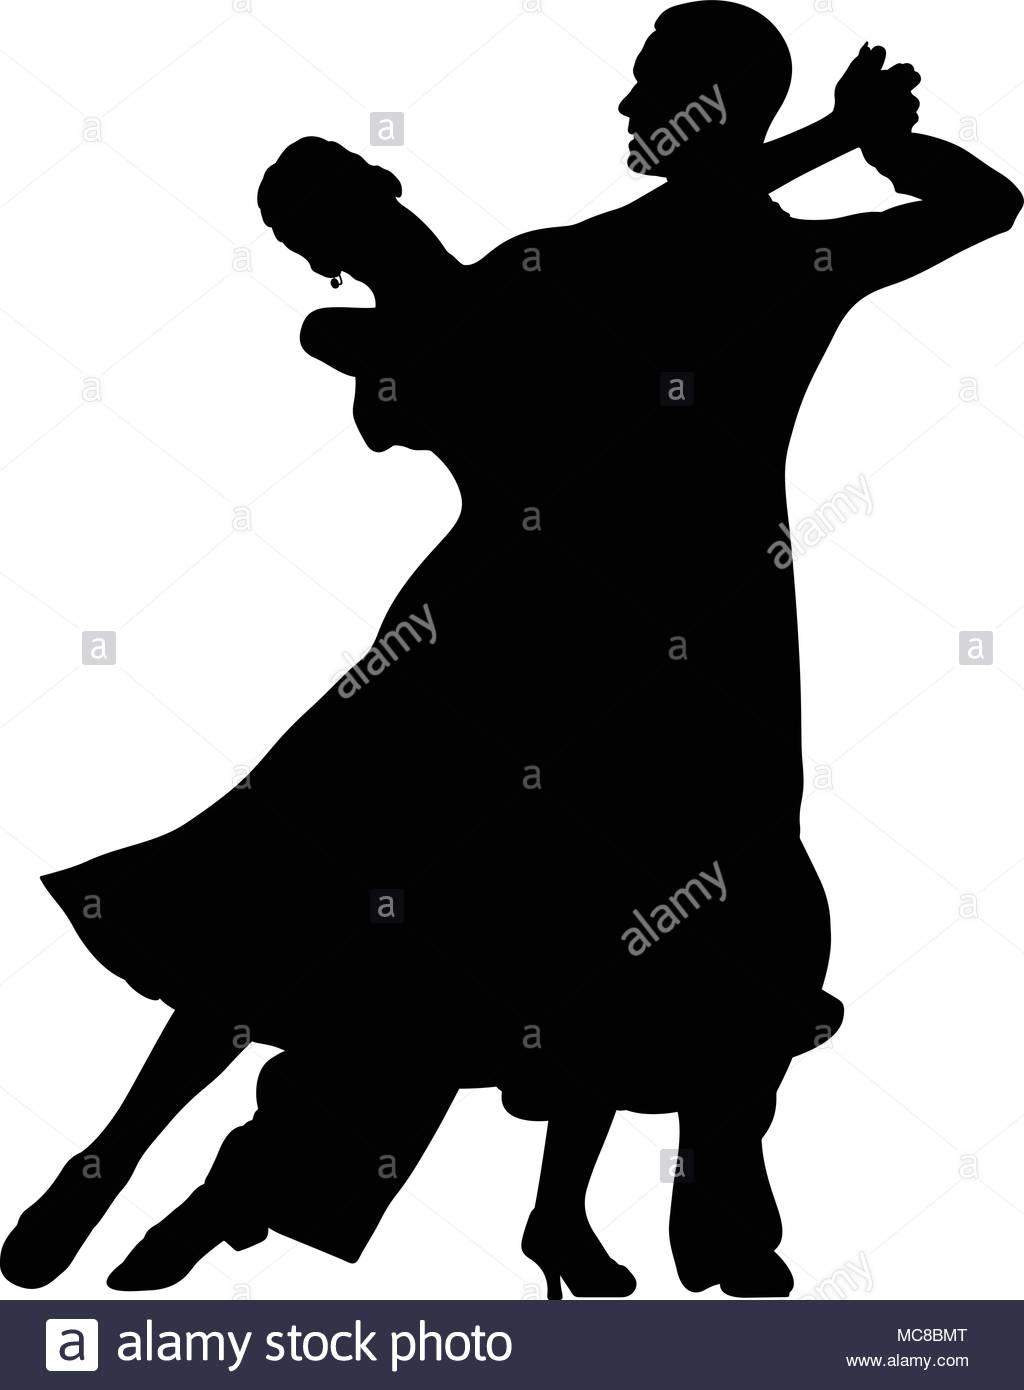 1024x1390 Ballroom Dancing Black Silhouette Pair Women And Men Dancer Stock